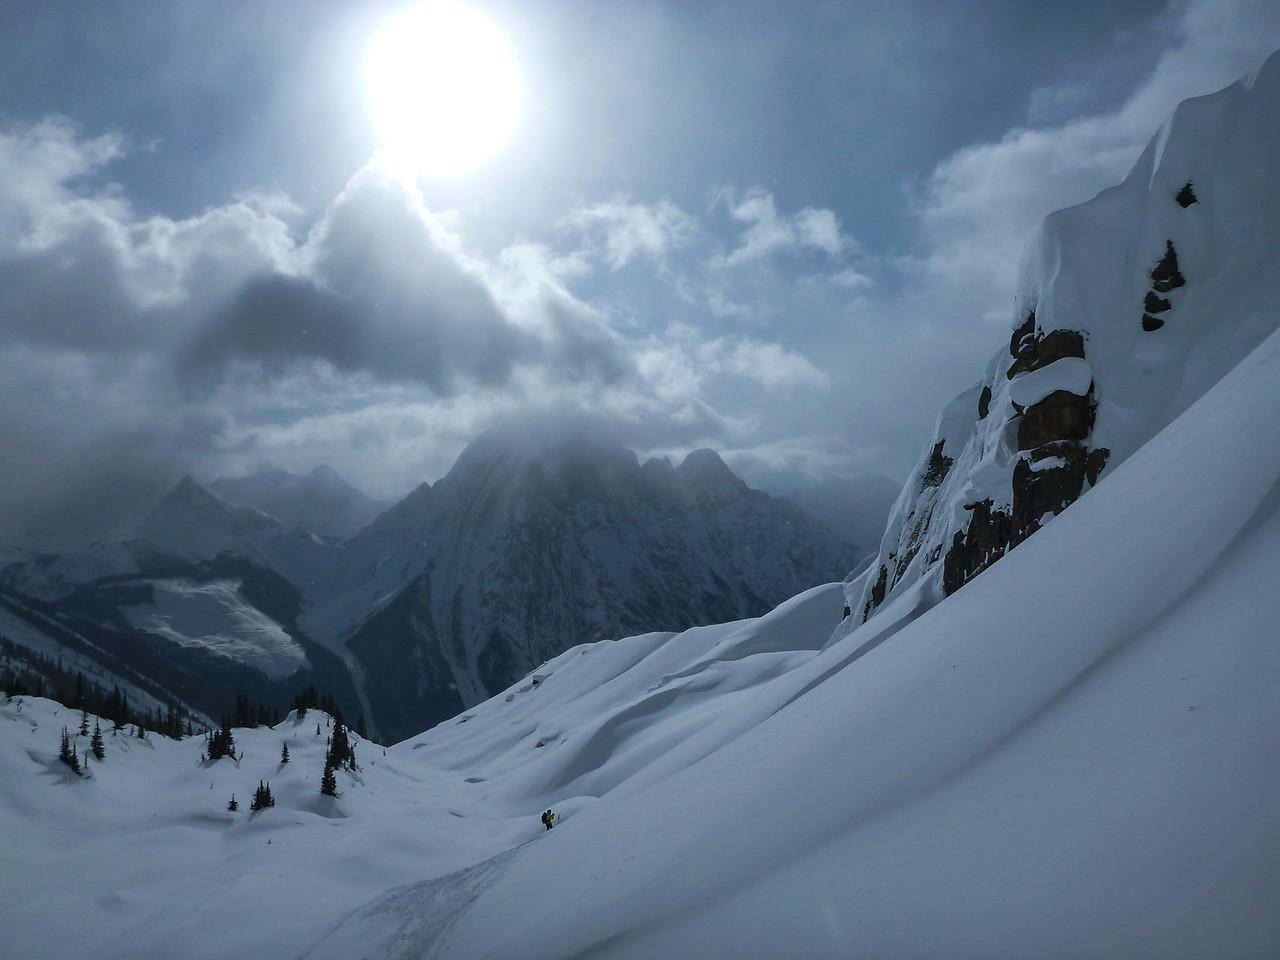 2013 Icefall Lodge ski trip